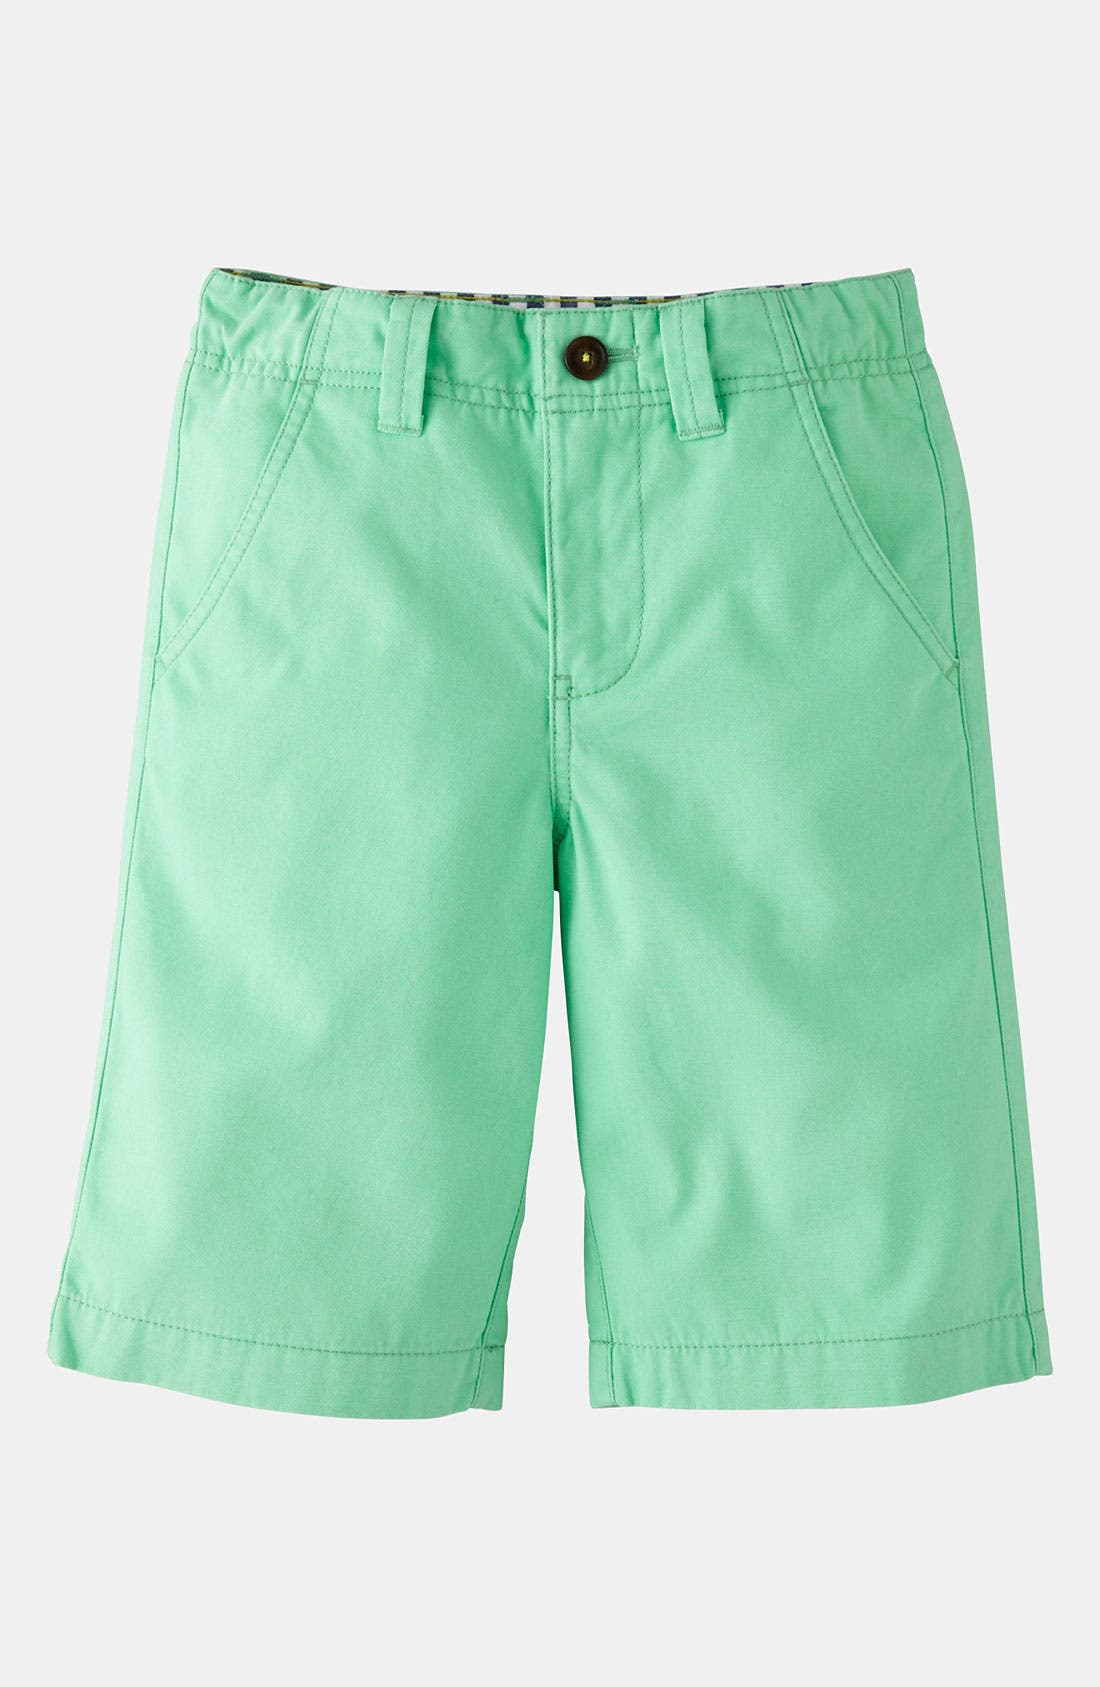 Alternate Image 1 Selected - Mini Boden 'Deck' Shorts (Toddler, Little Boys & Big Boys)